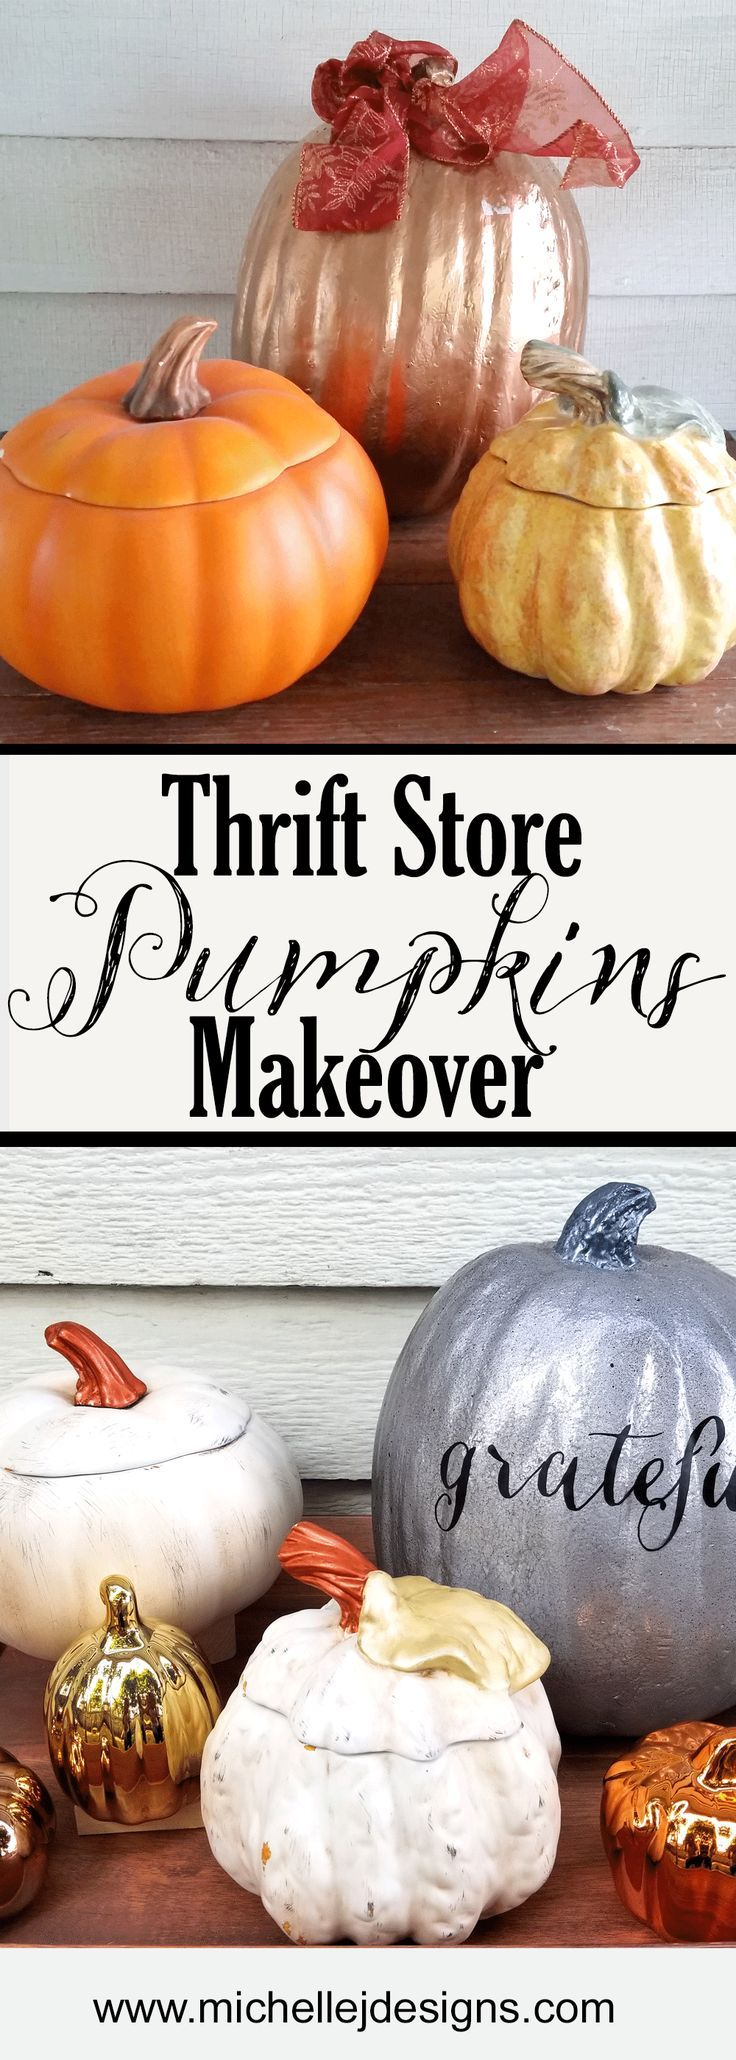 How to store pumpkins - Thrift Store Pumpkins Makeover For Fall Home Decor